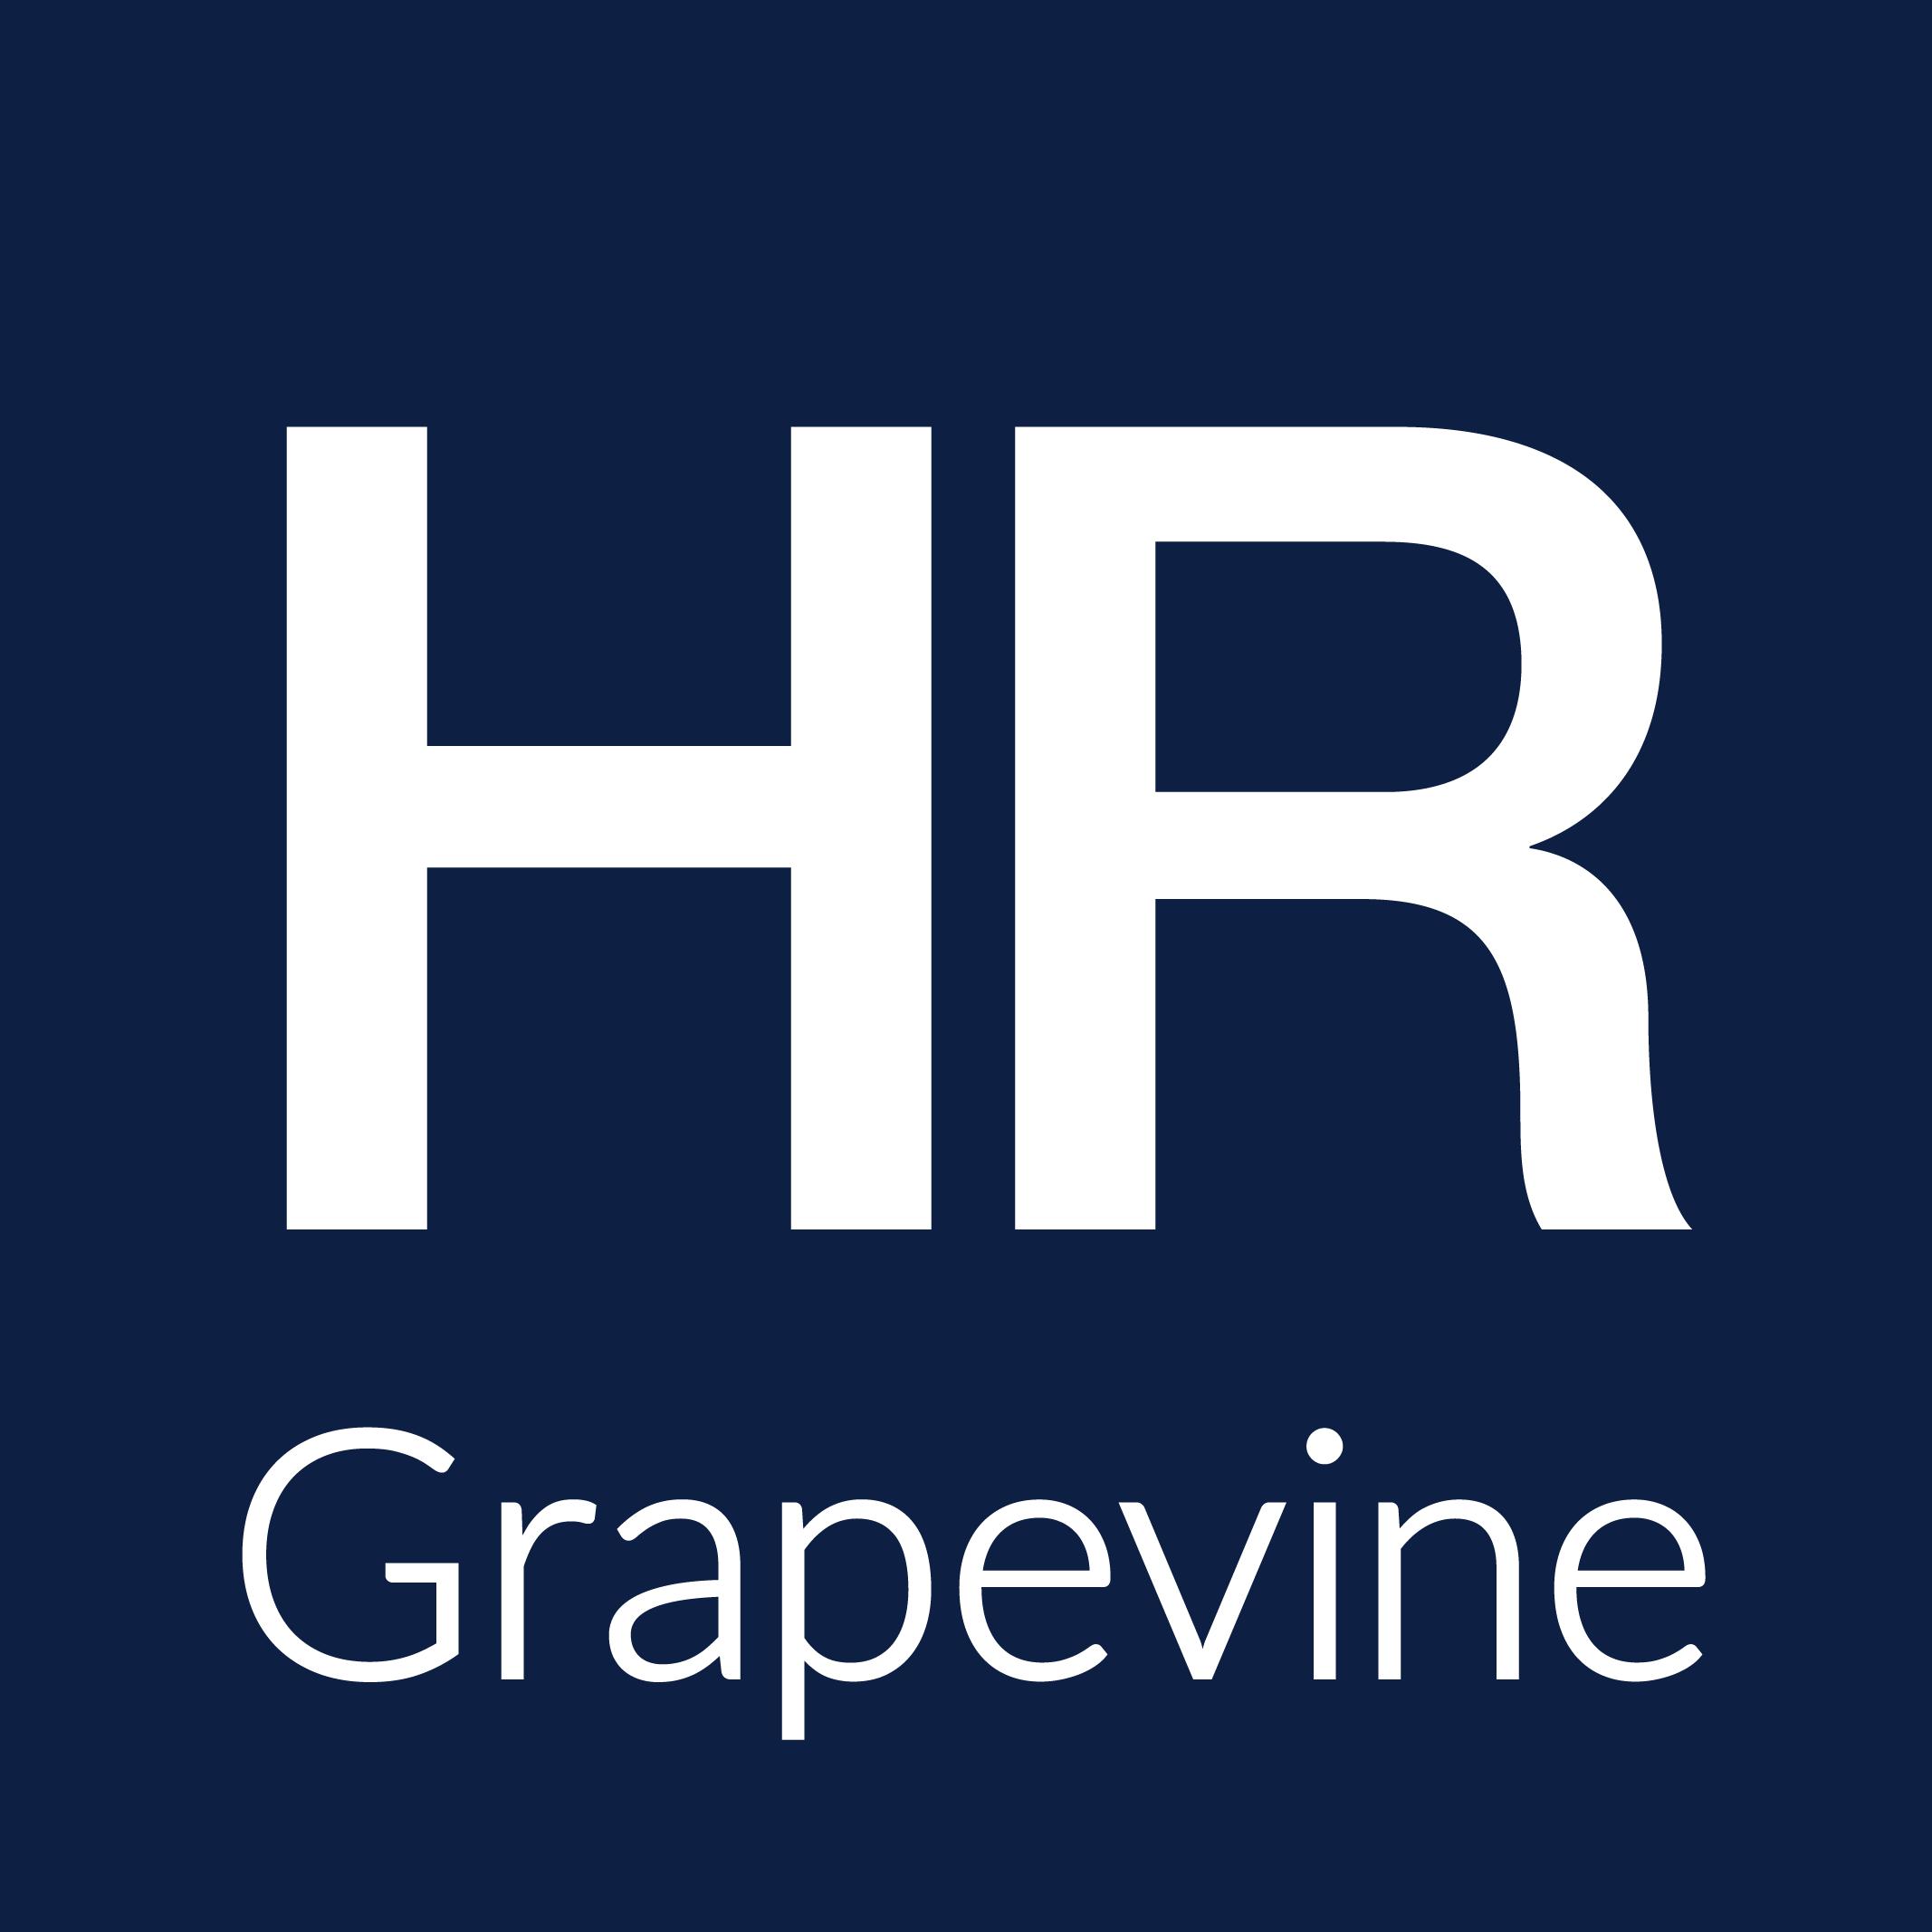 hr-grapevine-logo-square-navy